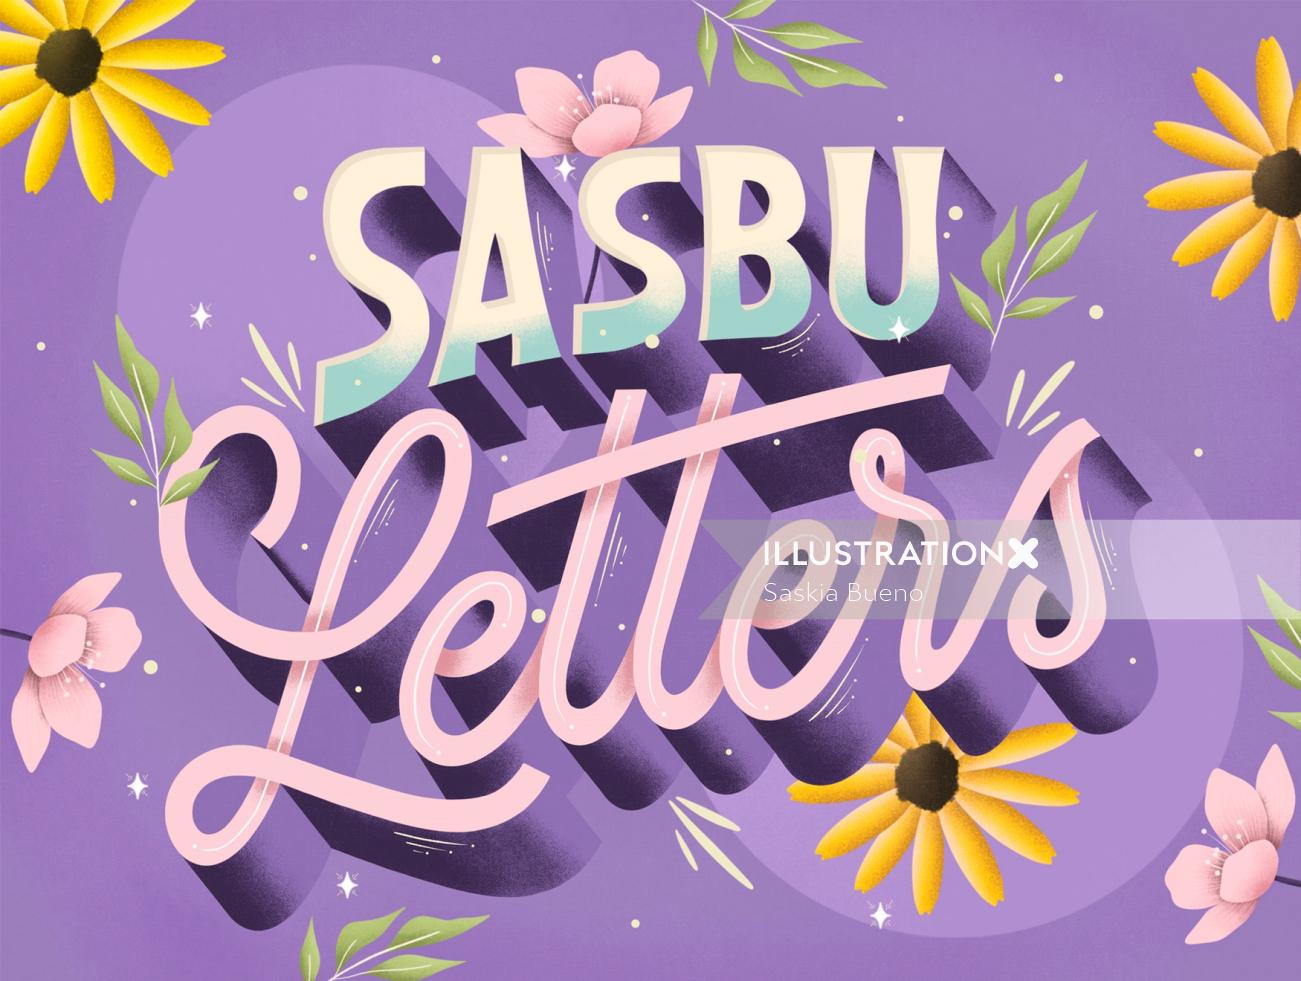 Calligraphy design of sasbu letters